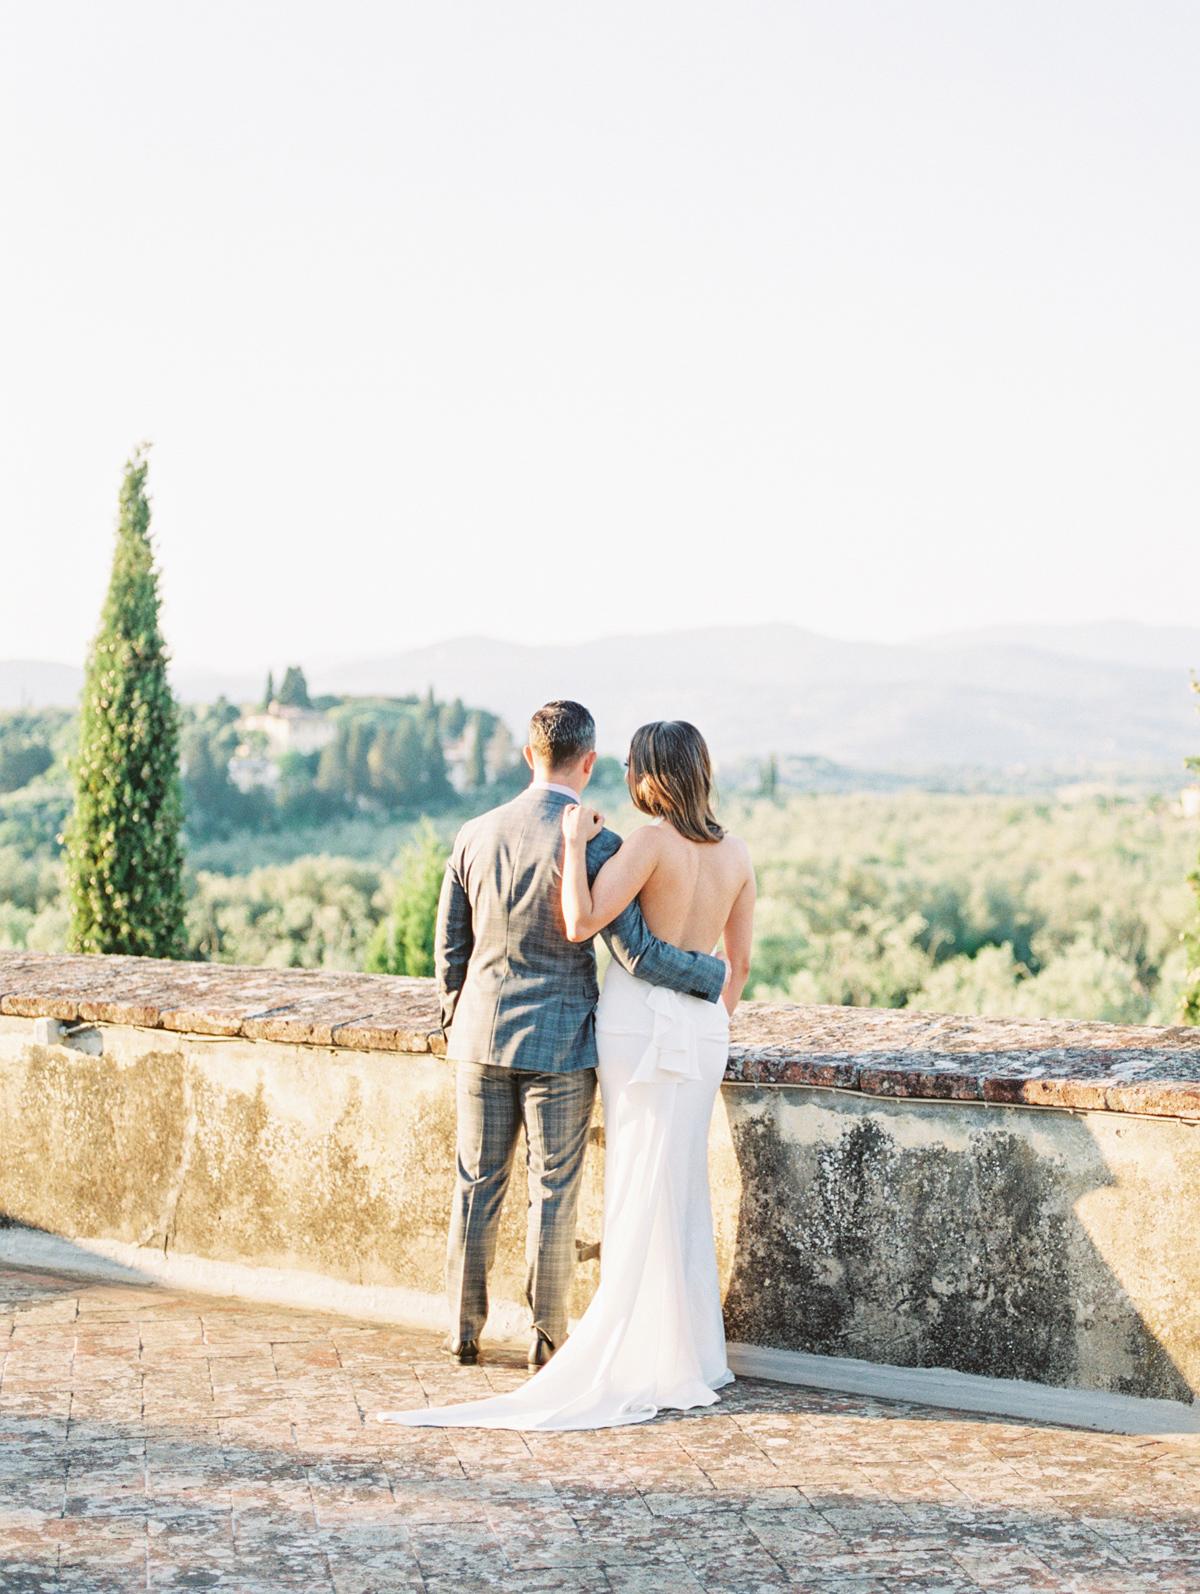 saghar ben wedding couple on stone lookout